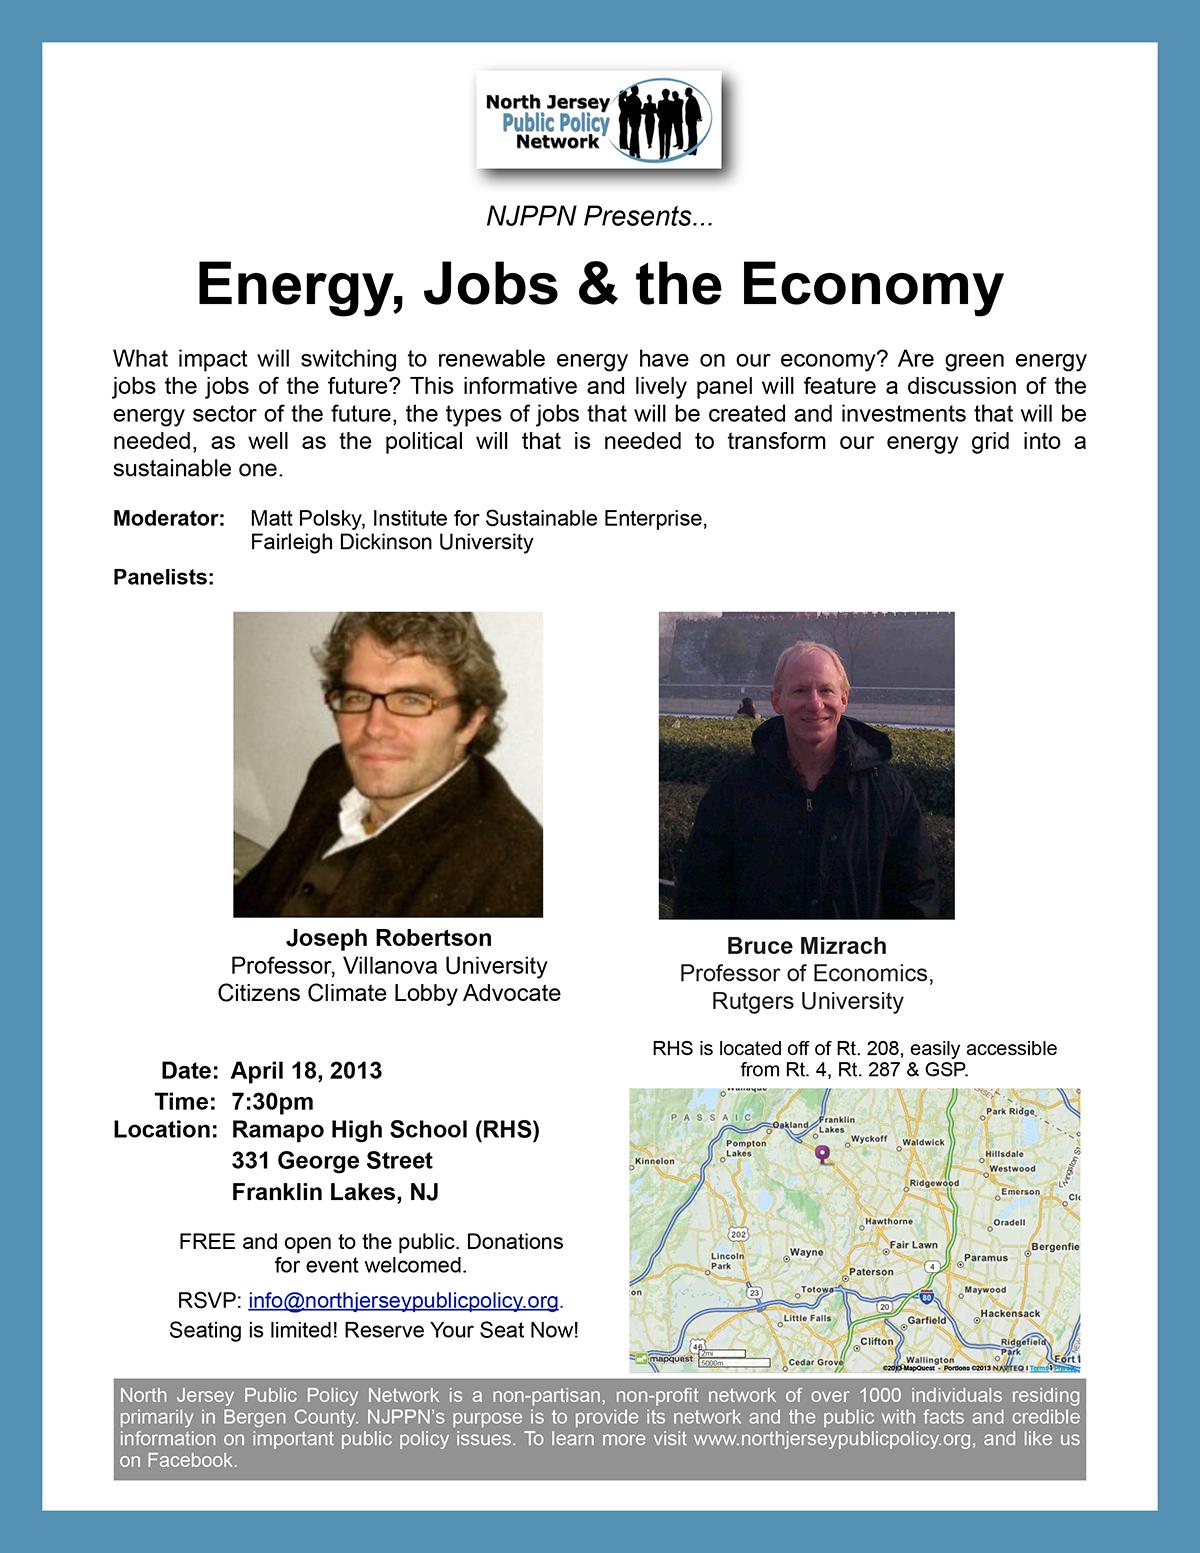 NJPPN Event on Energy, Jobs & the Green Economy: 4/18